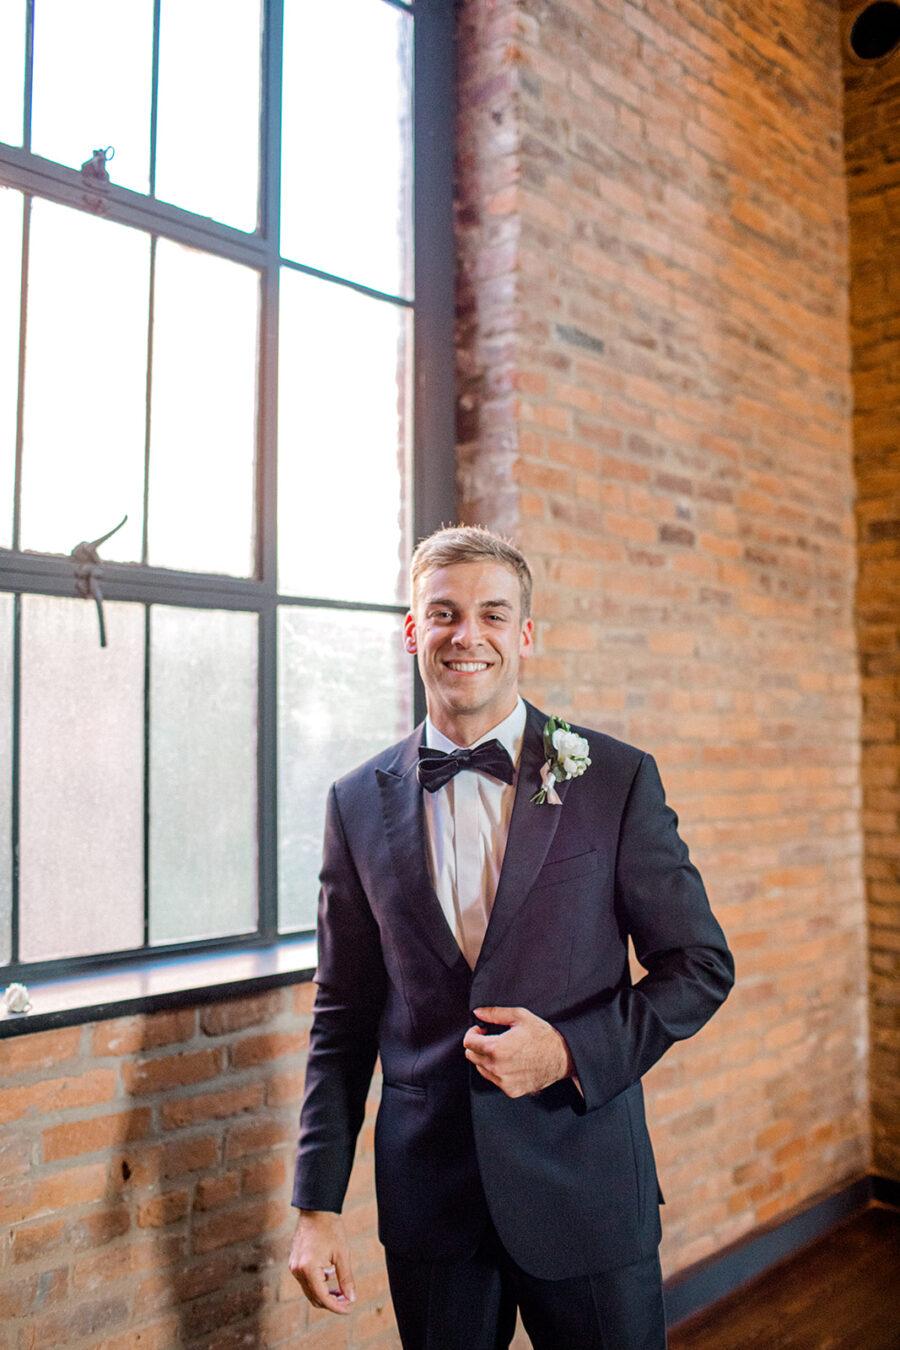 The Black Tux wedding tuxedo with bow tie